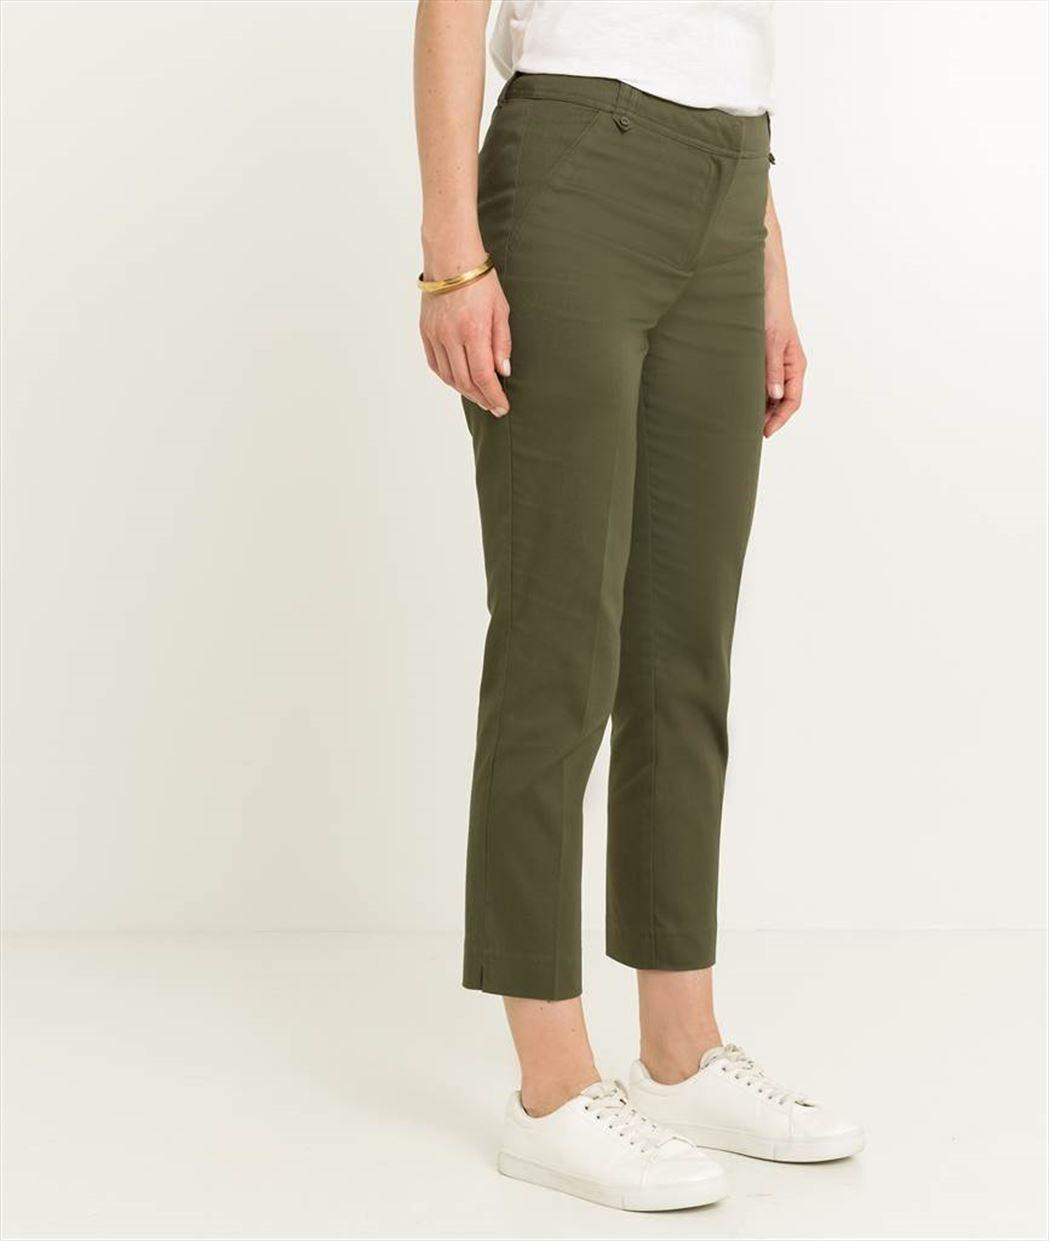 Pantalon femme 7/8ème en satin de coton KAKI